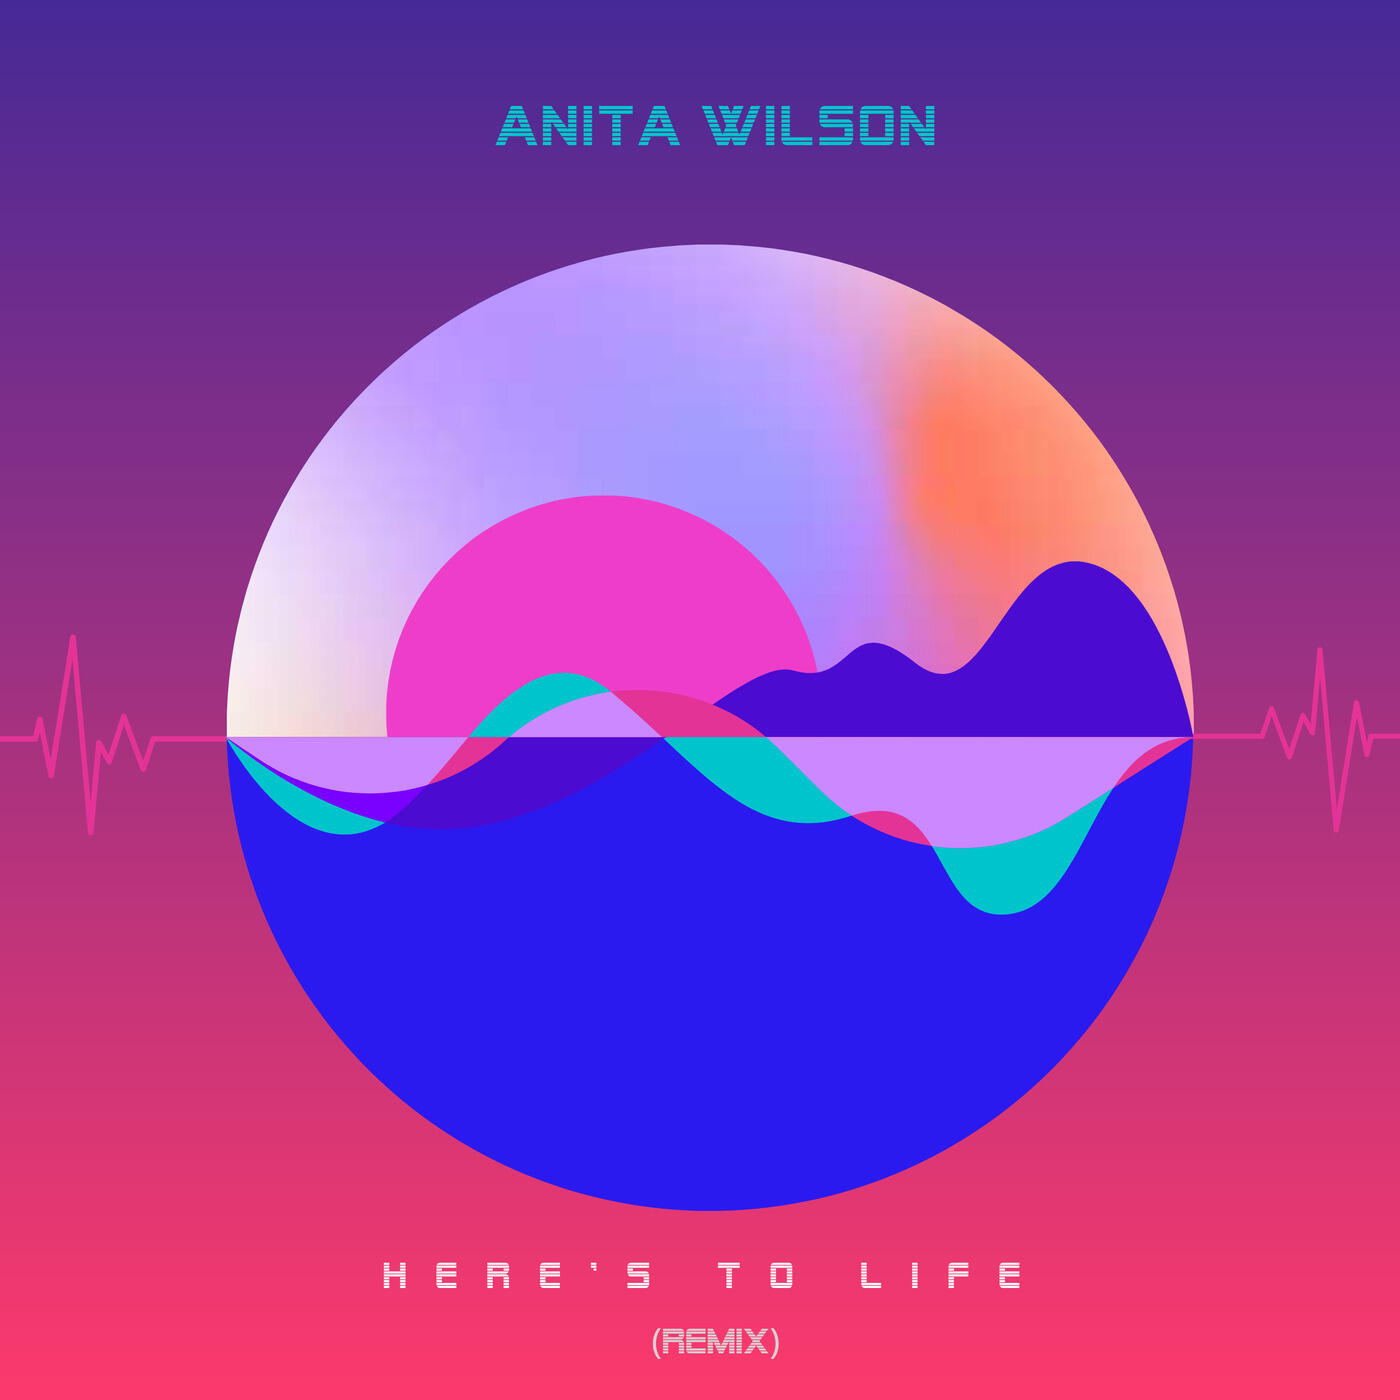 Stream Free Songs By Anita Wilson Similar Artists Iheartradio